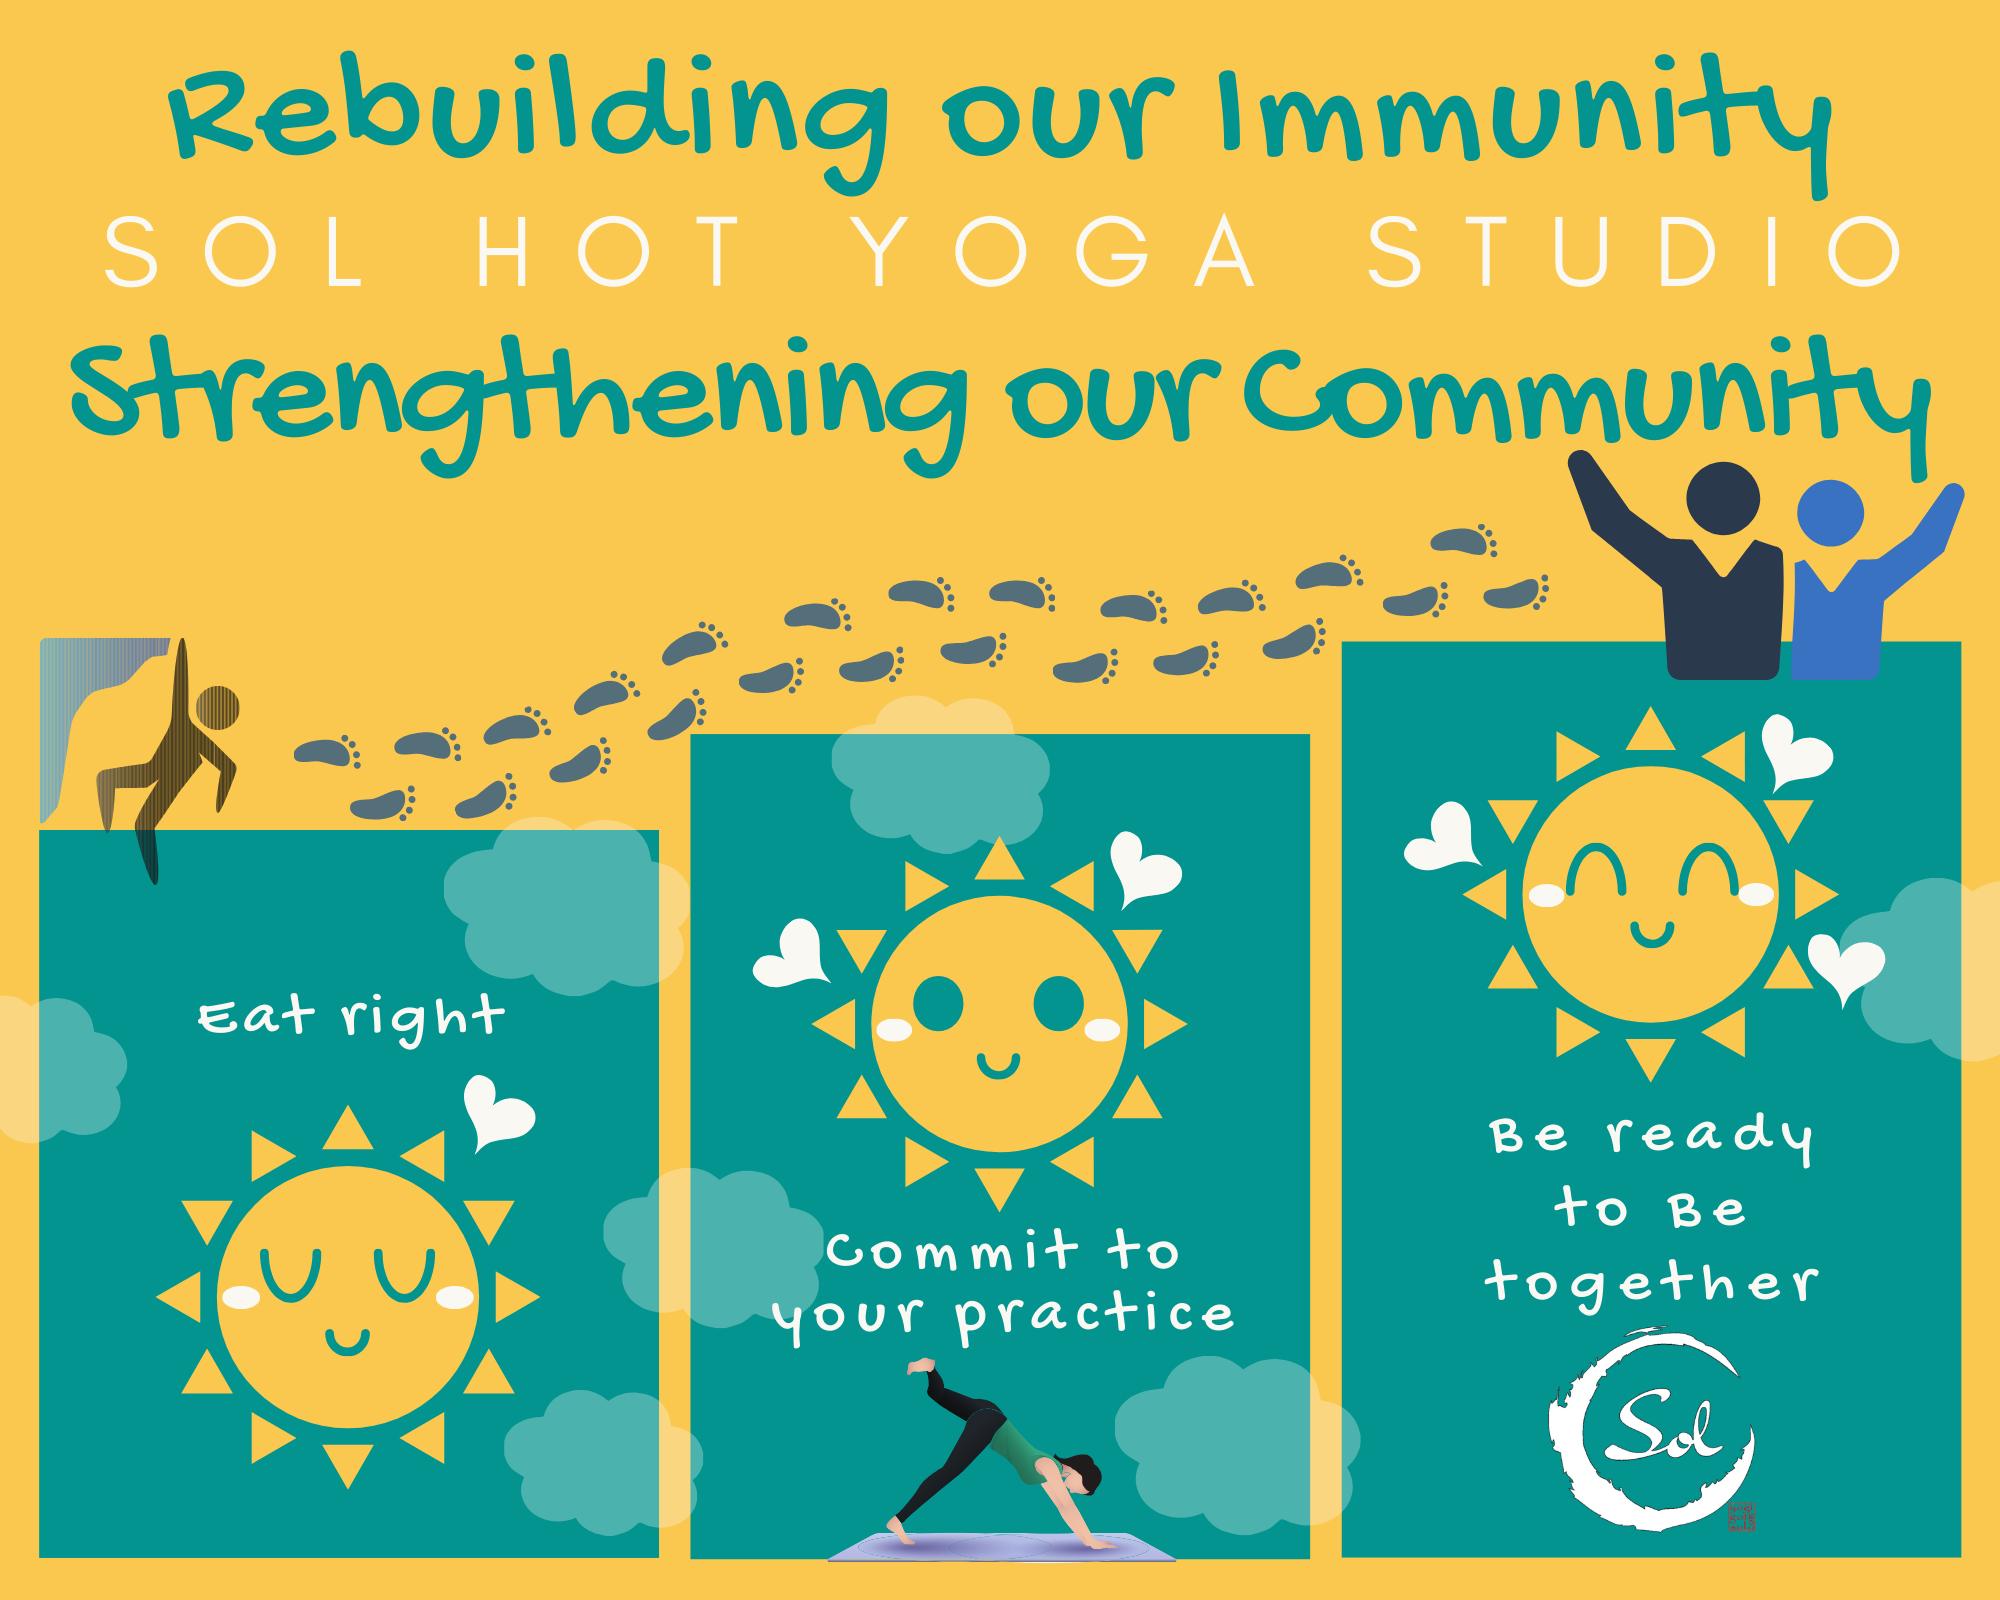 Rebuilding Immunity Strengthening Community